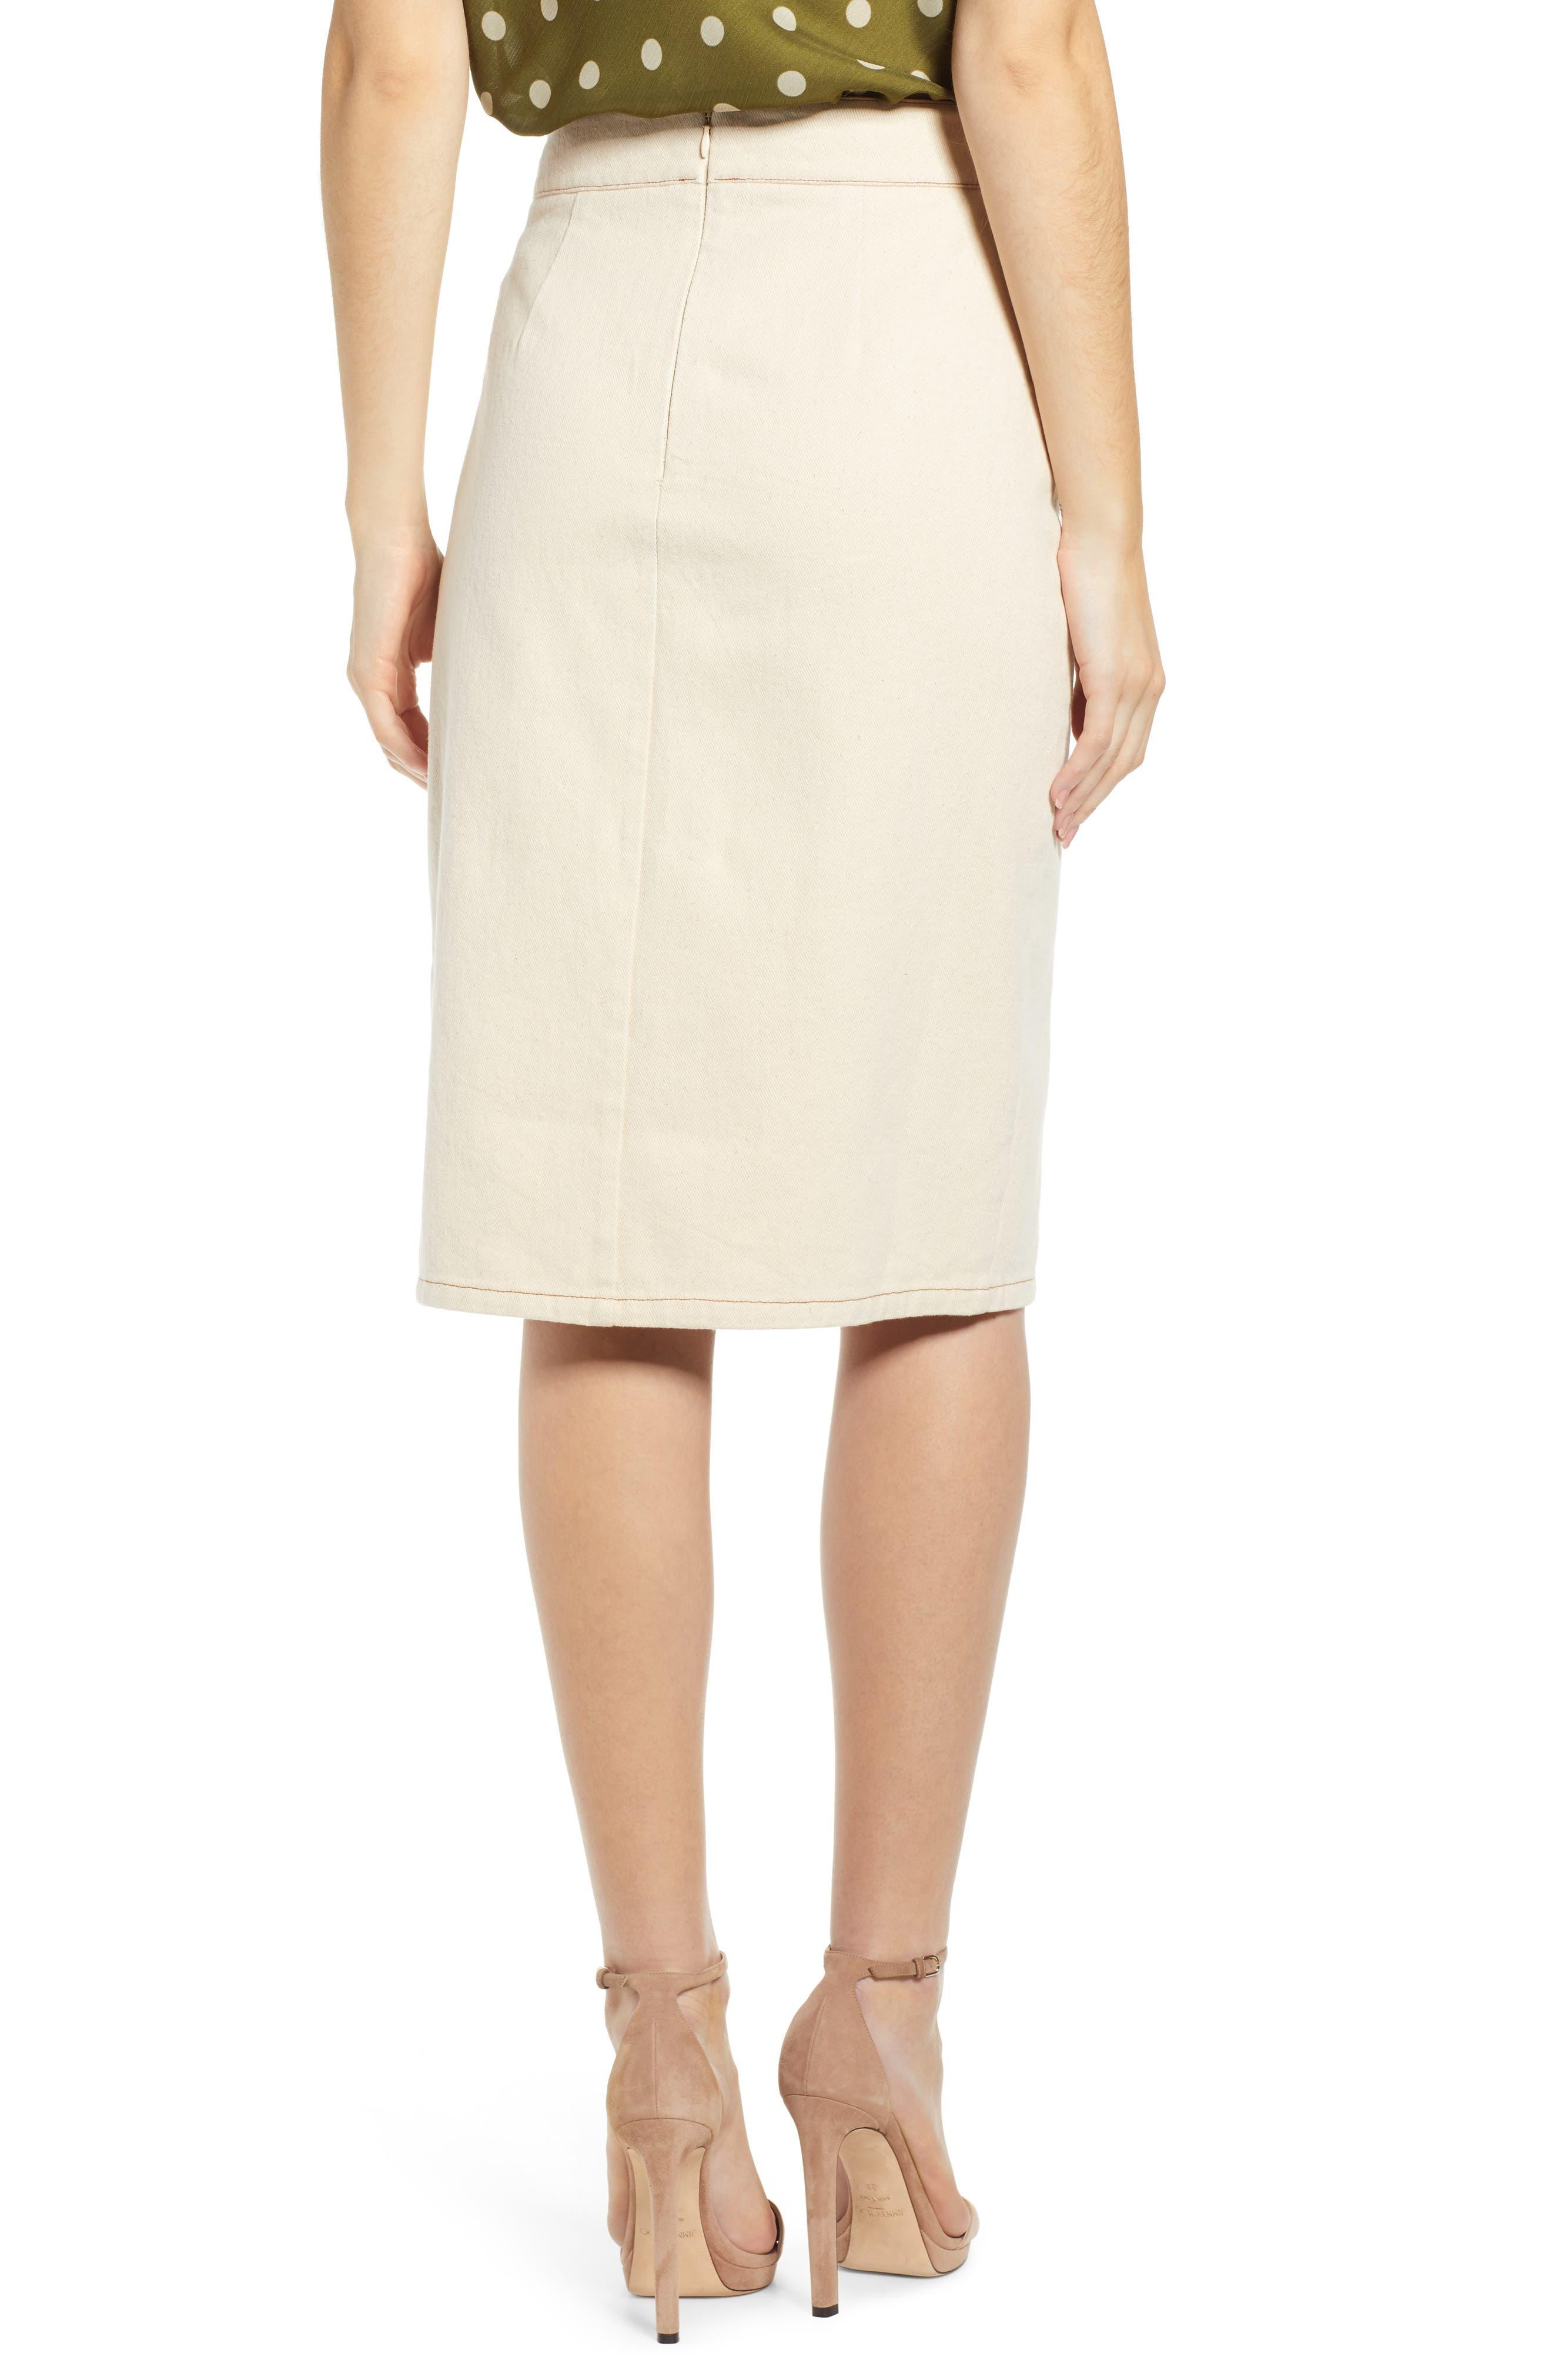 CHRISELLE LIM COLLECTION, Chriselle Lim Marine Midi Skirt, Alternate thumbnail 2, color, BONE